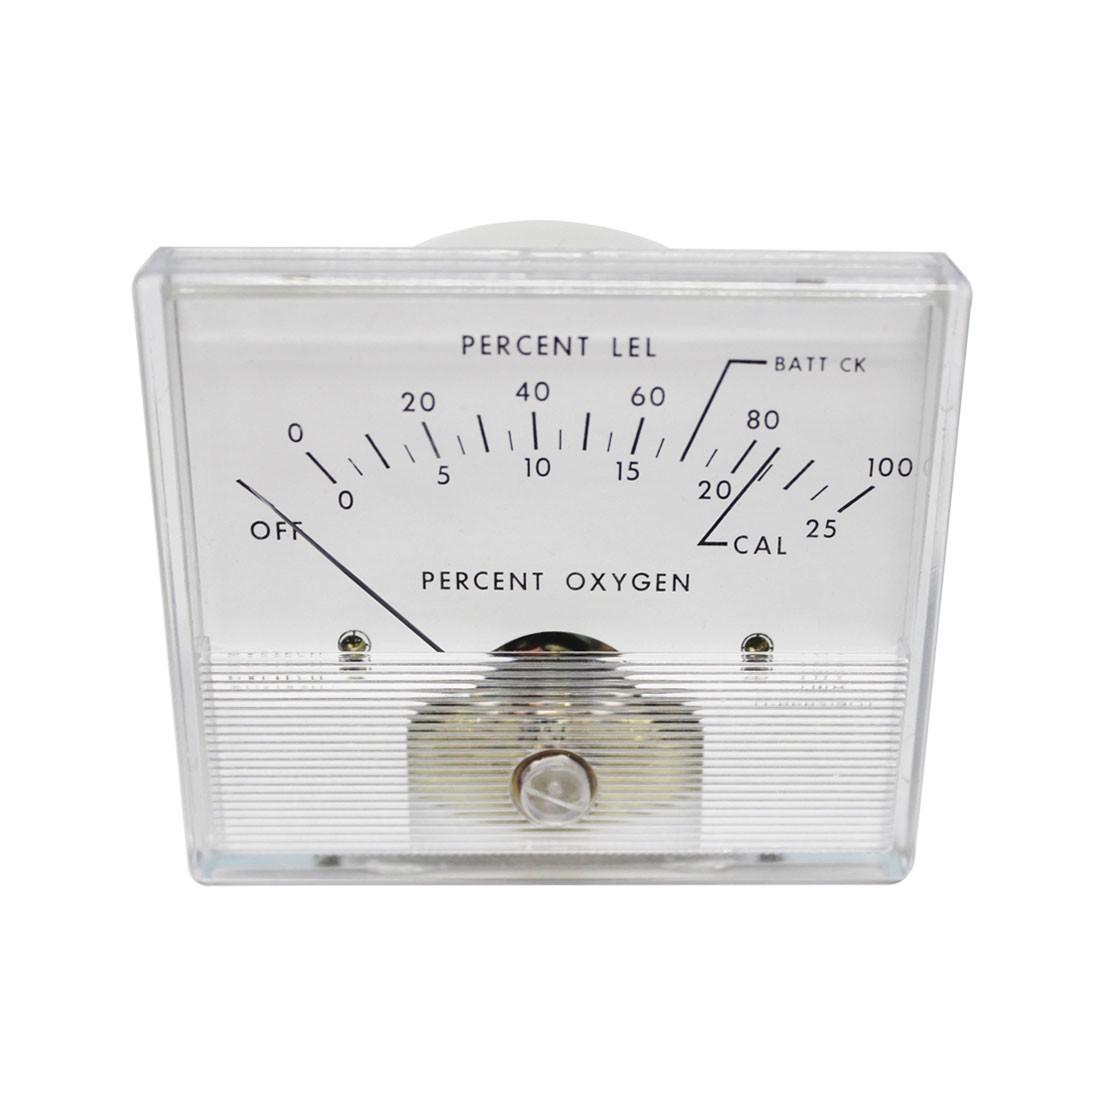 2026 AC Analog Panel Meter - Front View